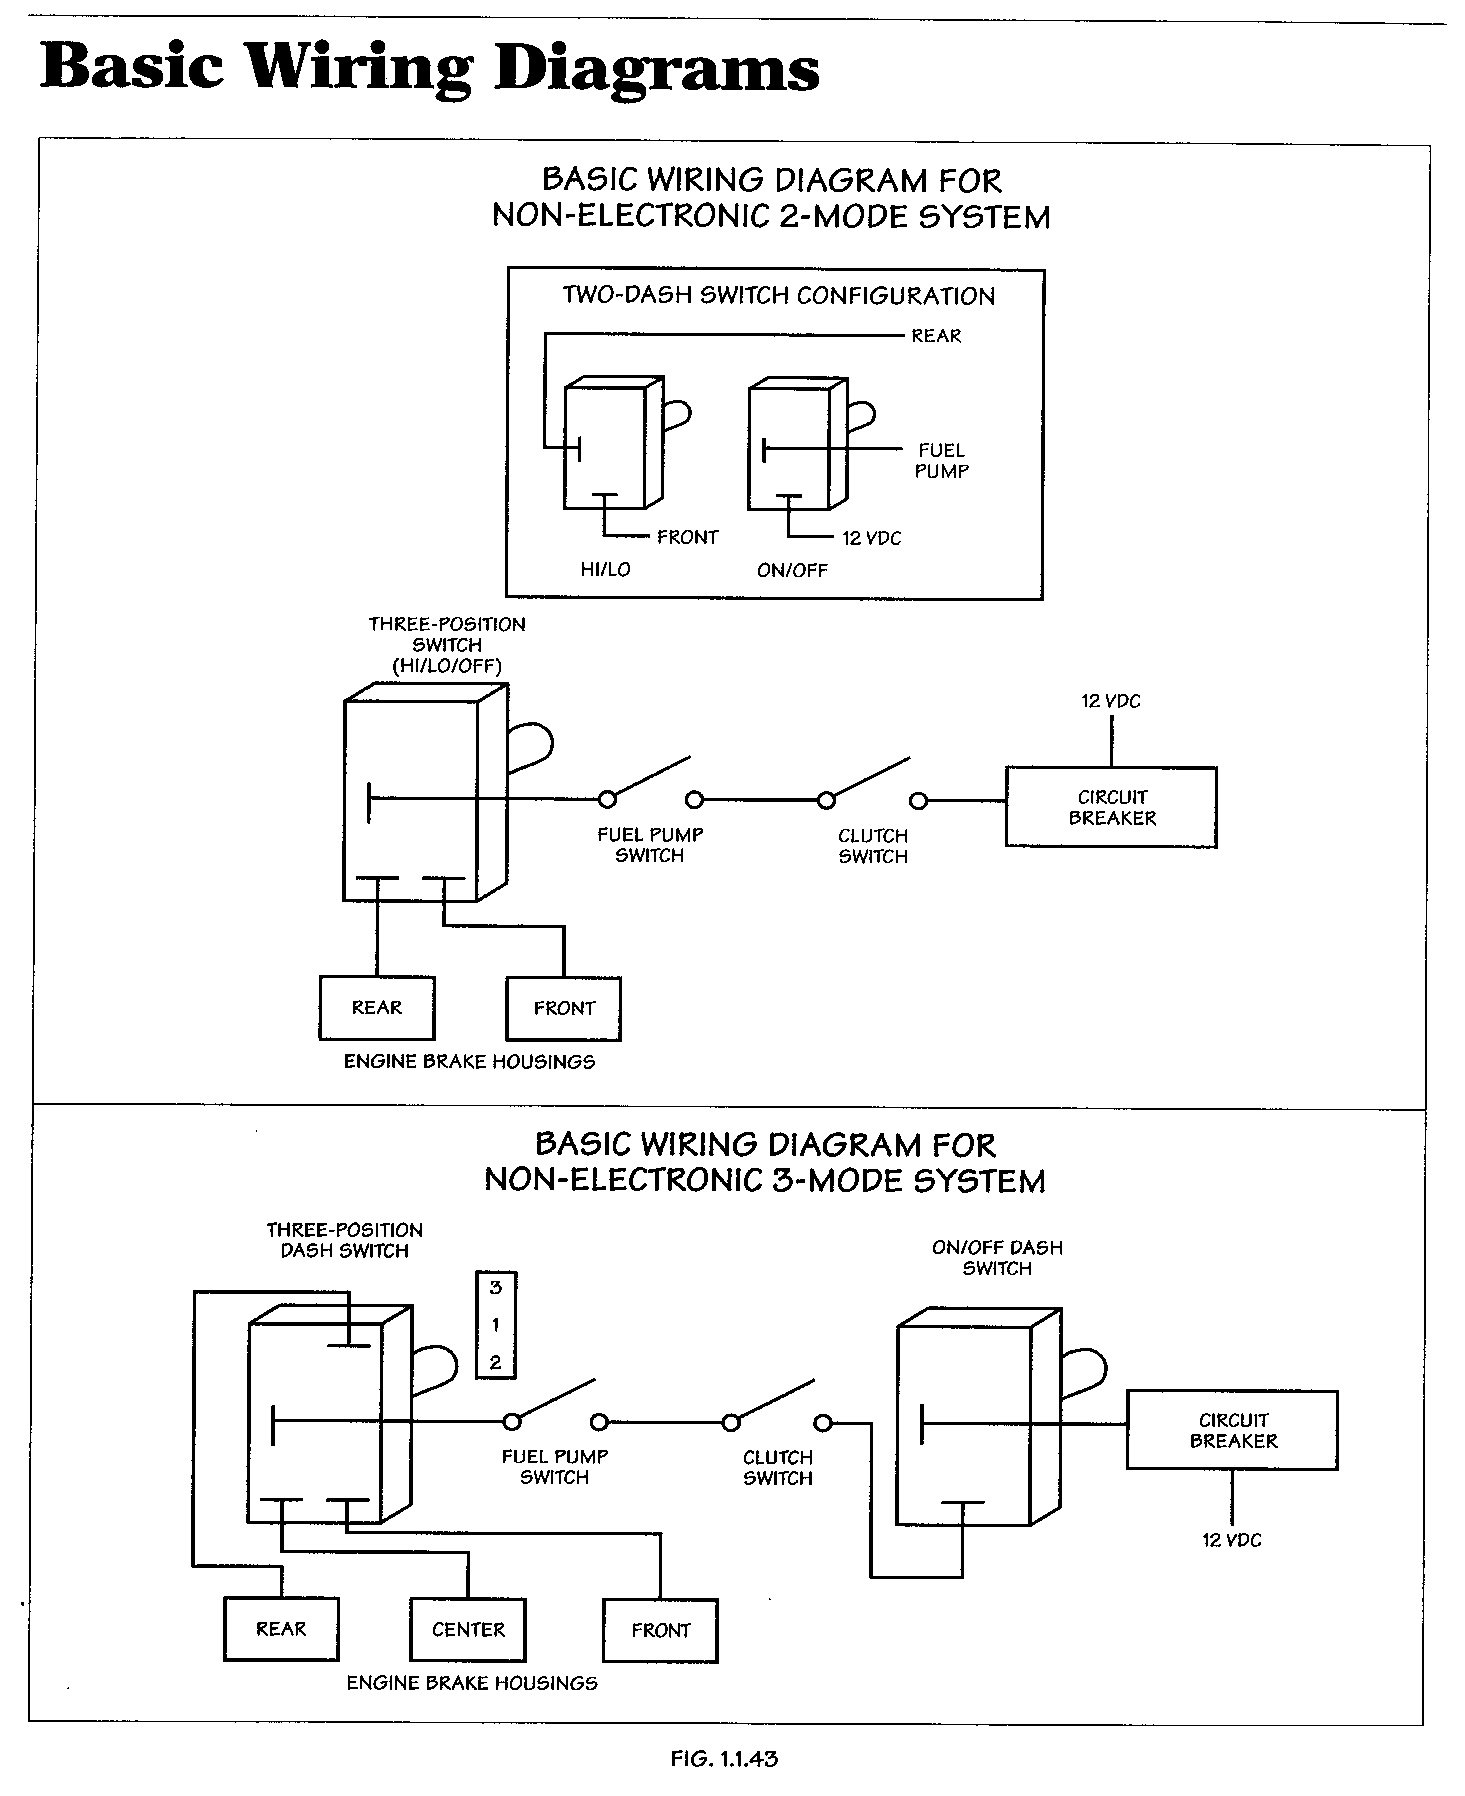 ZC_2397] Cummins Jake Brake Wiring Diagram Download DiagramExmet Mang Elec Mohammedshrine Librar Wiring 101